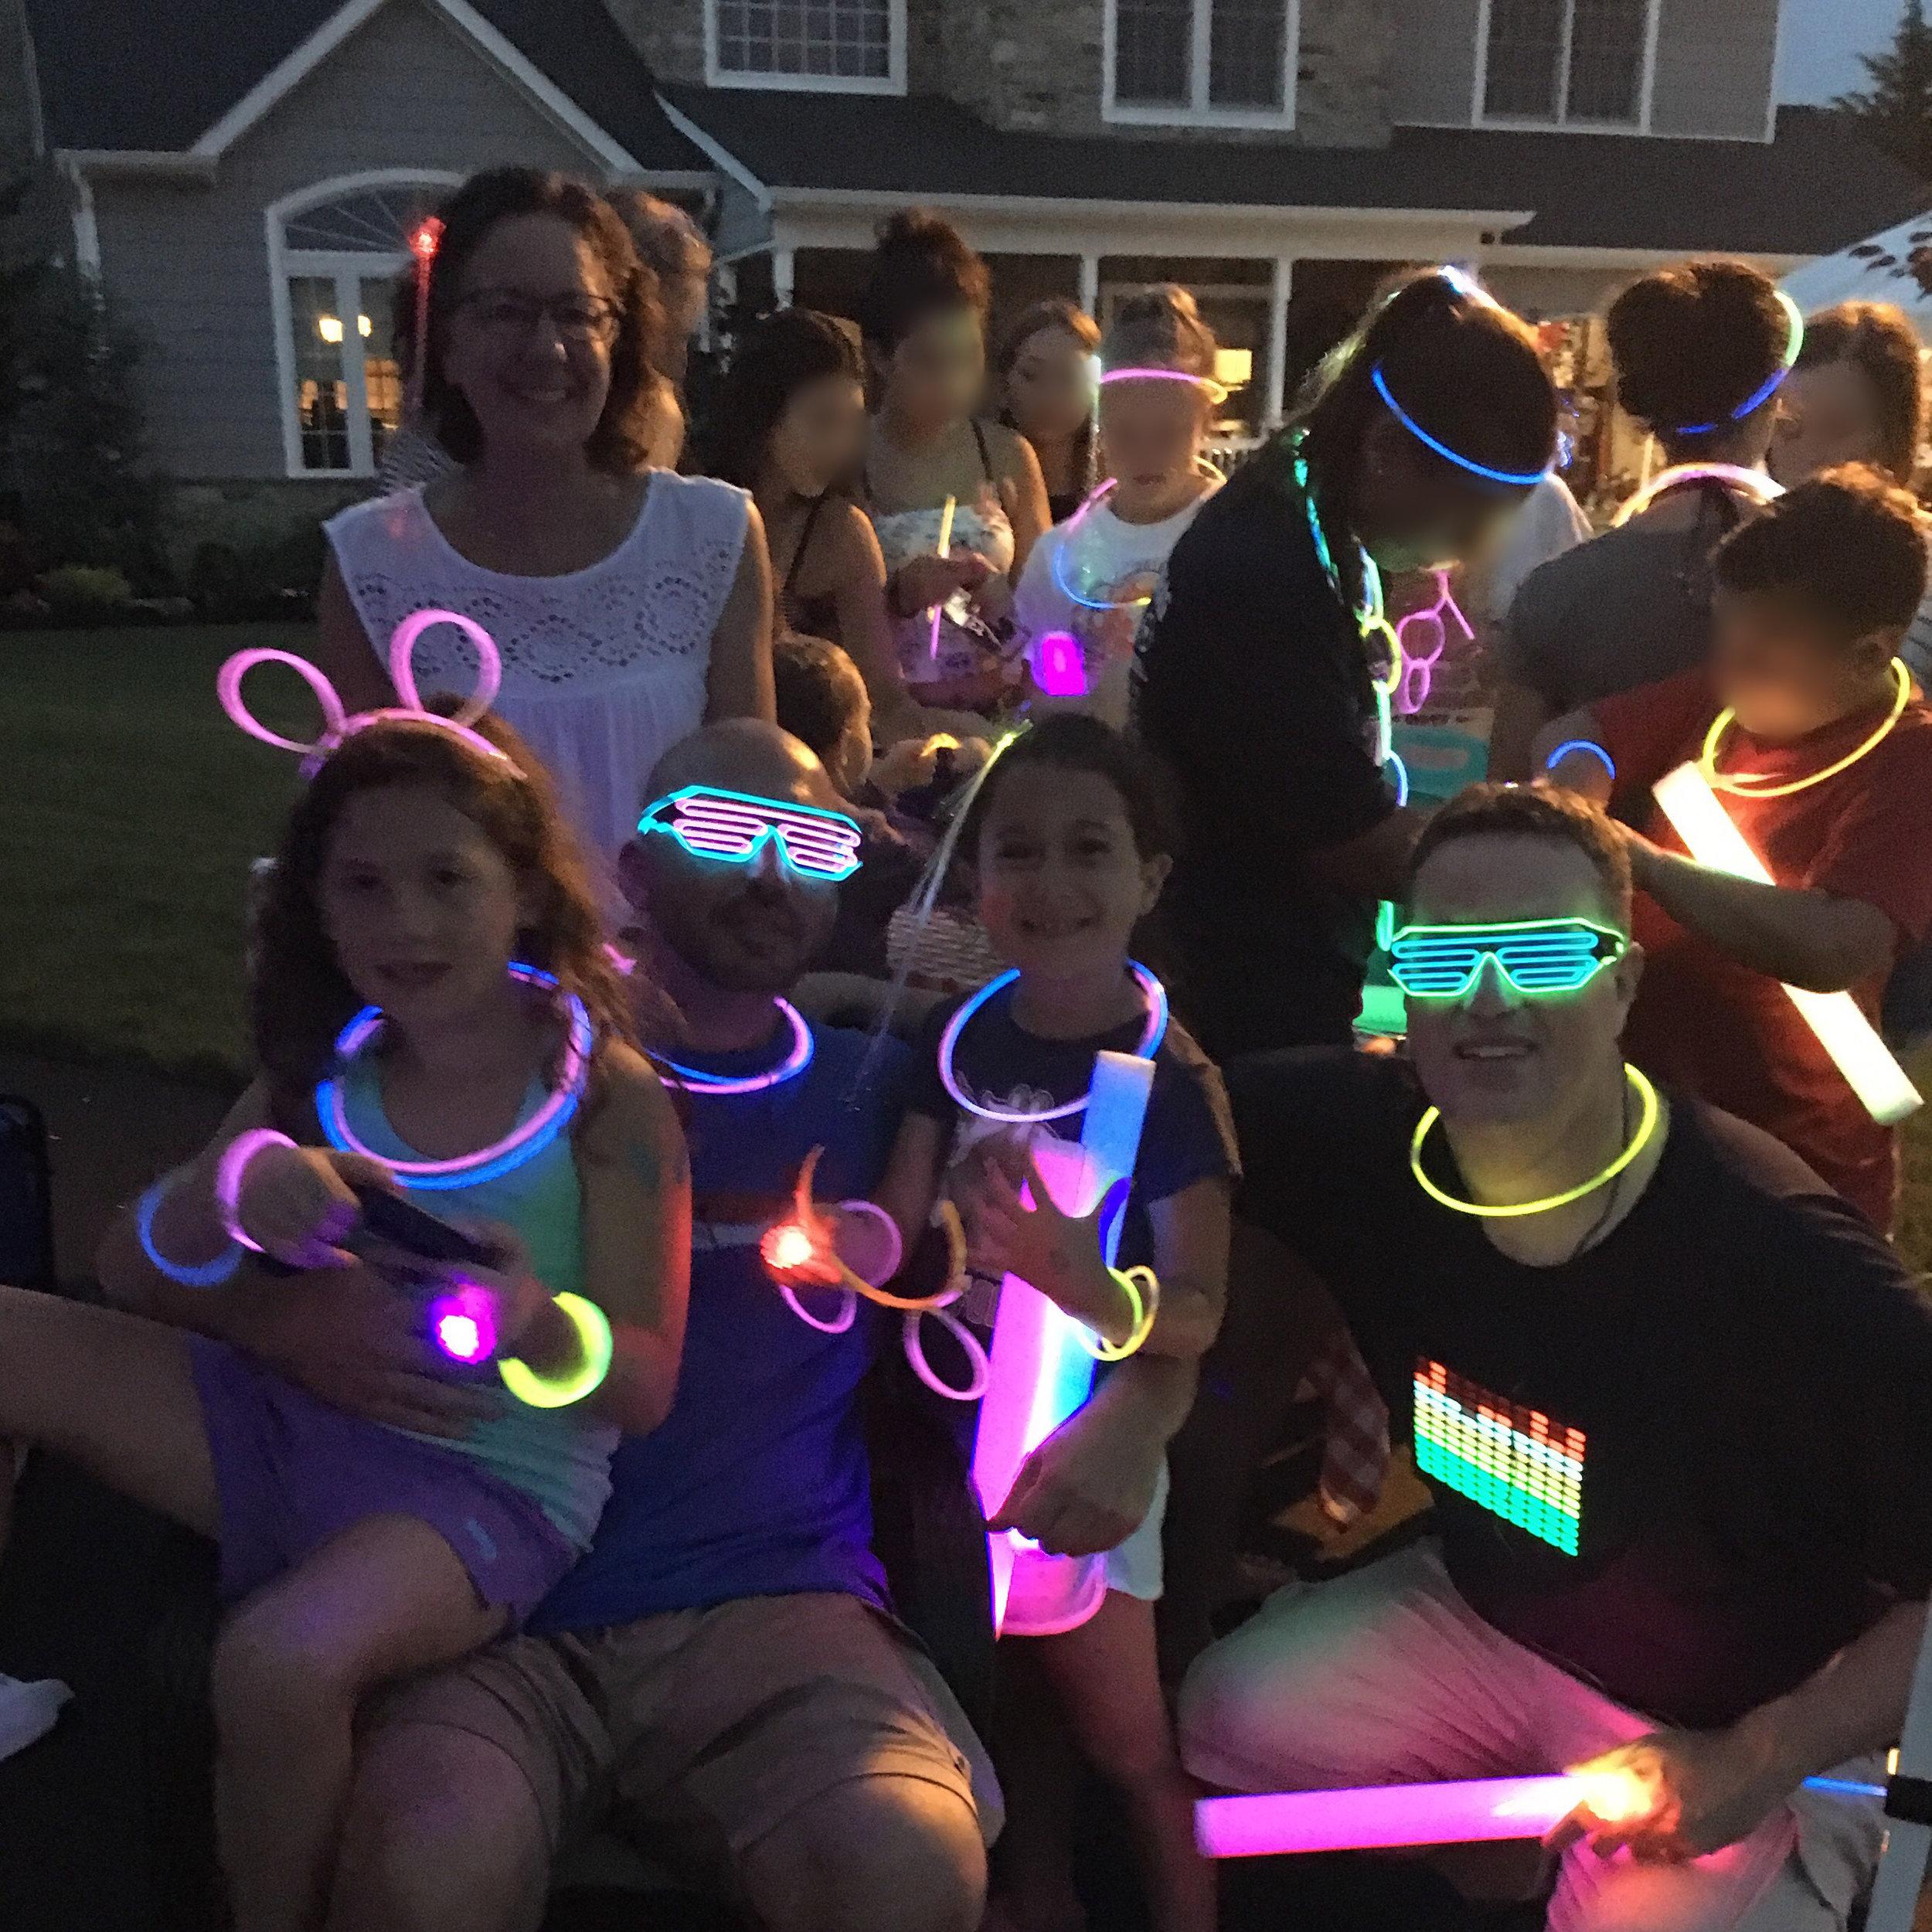 Glow in the dark fun at Block Party